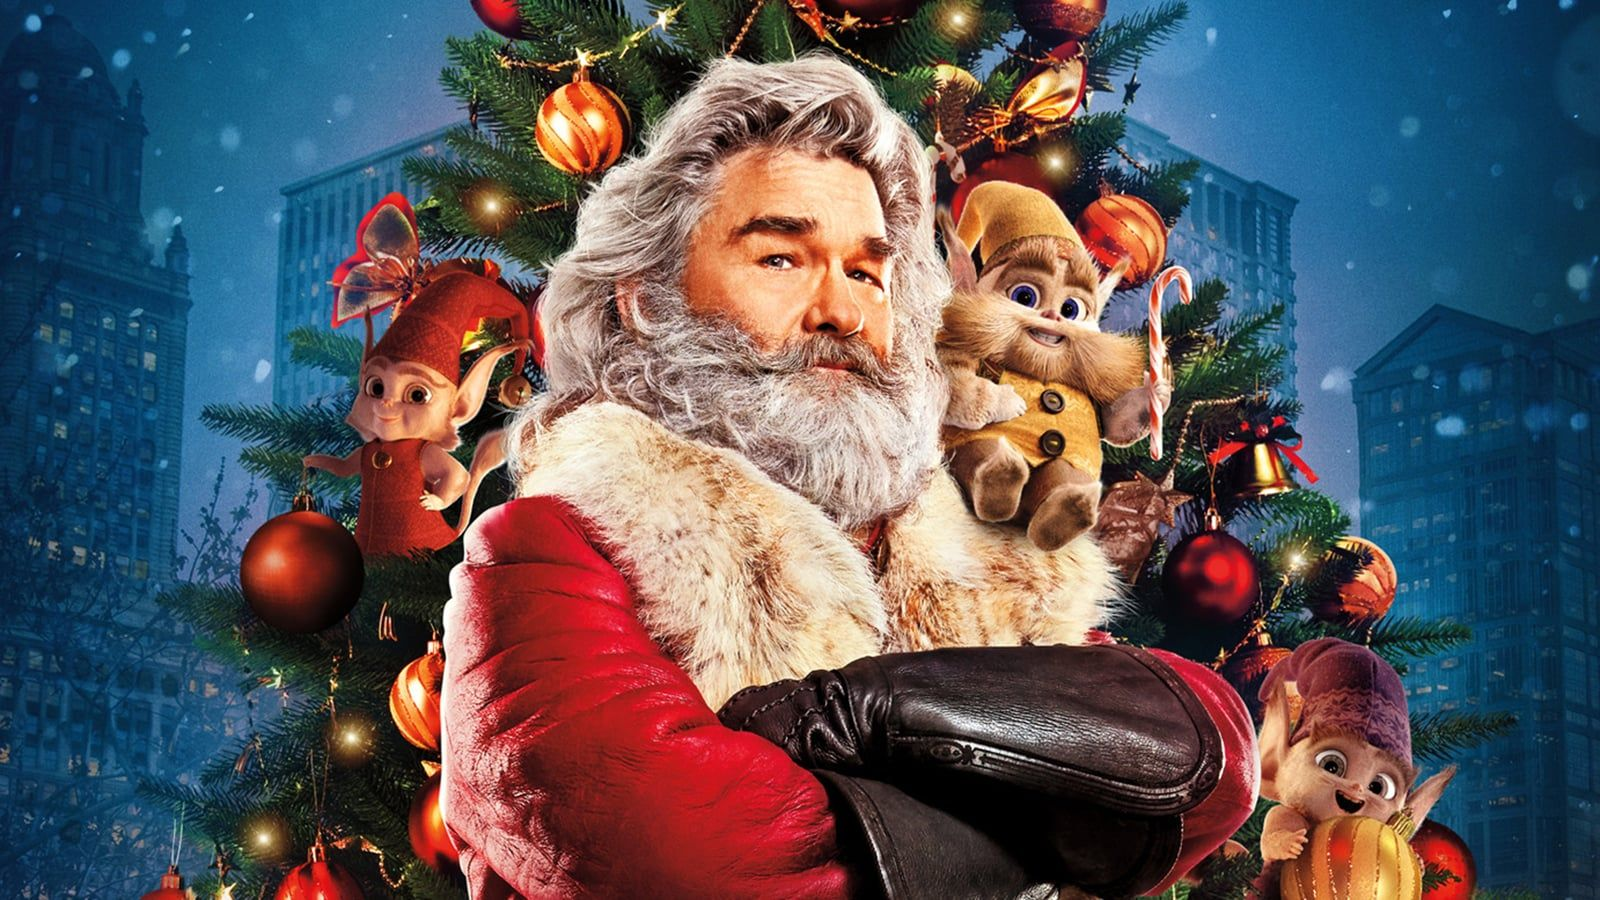 The Christmas Chronicles 2018 Ganzer Film Deutsch Komplett Kino The Christmas Chronicles 2018complete Film Deutsch The Chr Ganze Filme Filme Filme Stream